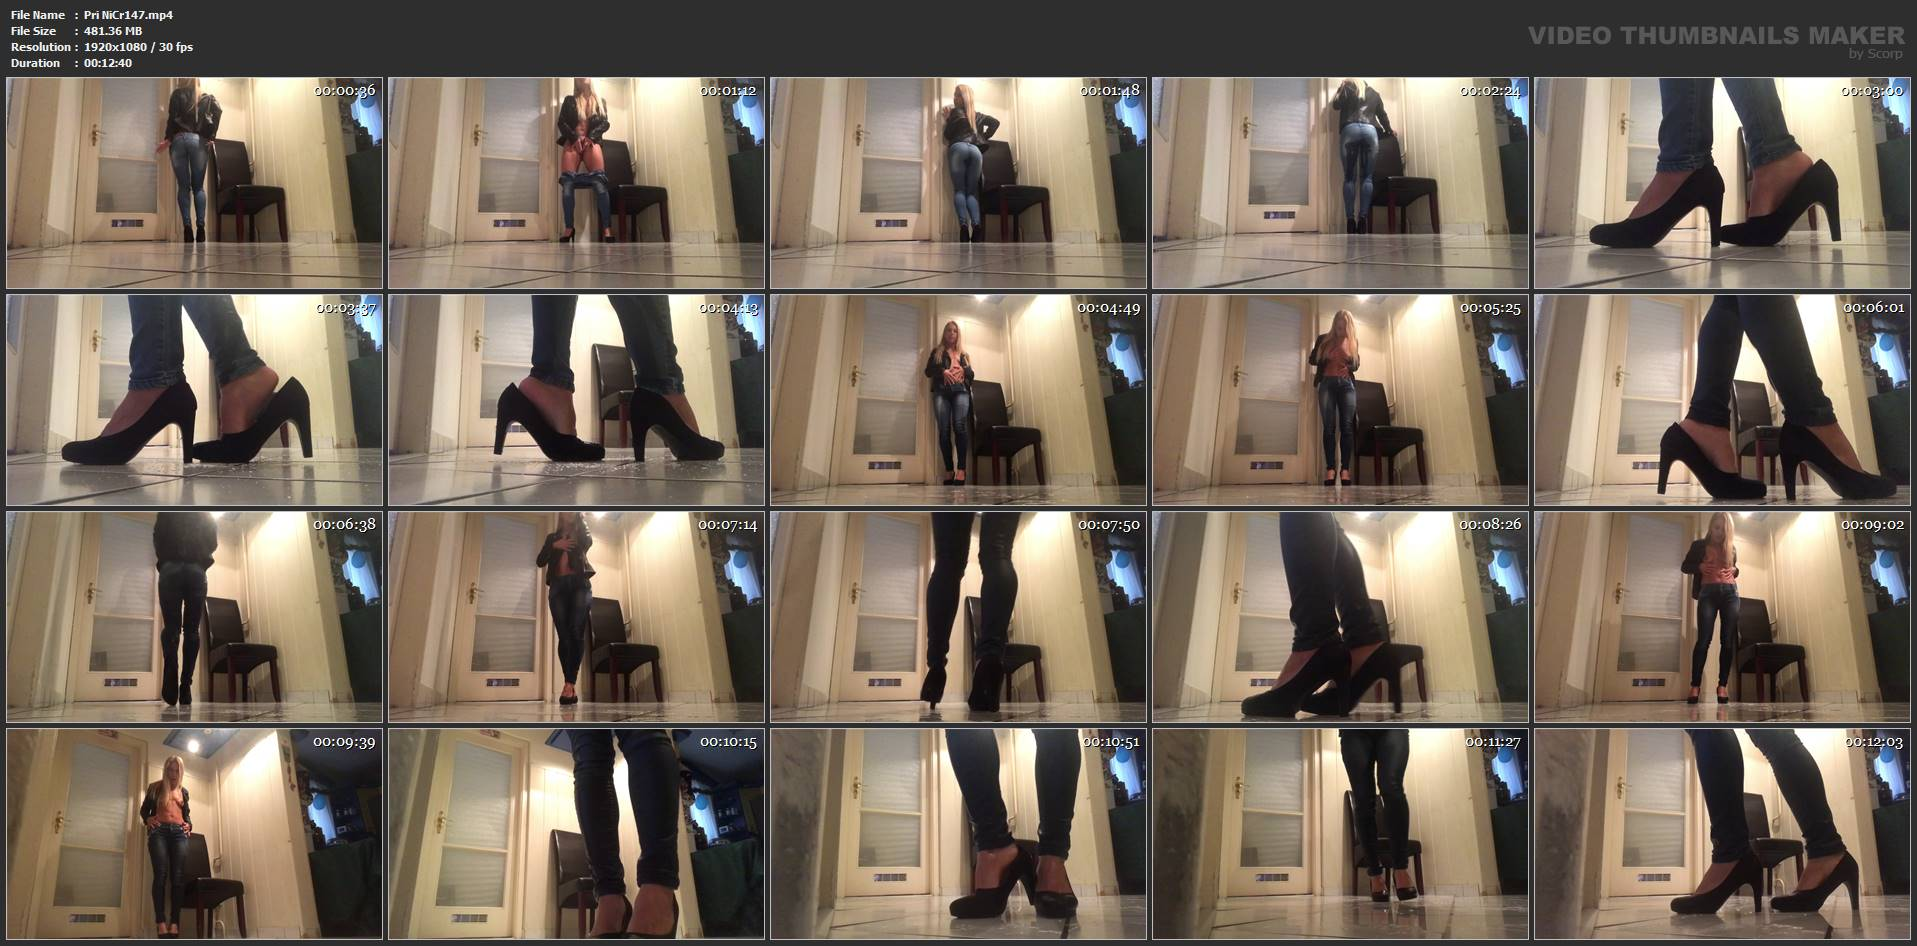 [PRINCESS NIKKI'S EMPIRE] Shoe Pee. Featuring: Nikki Cruel [FULL HD][1080p][MP4]